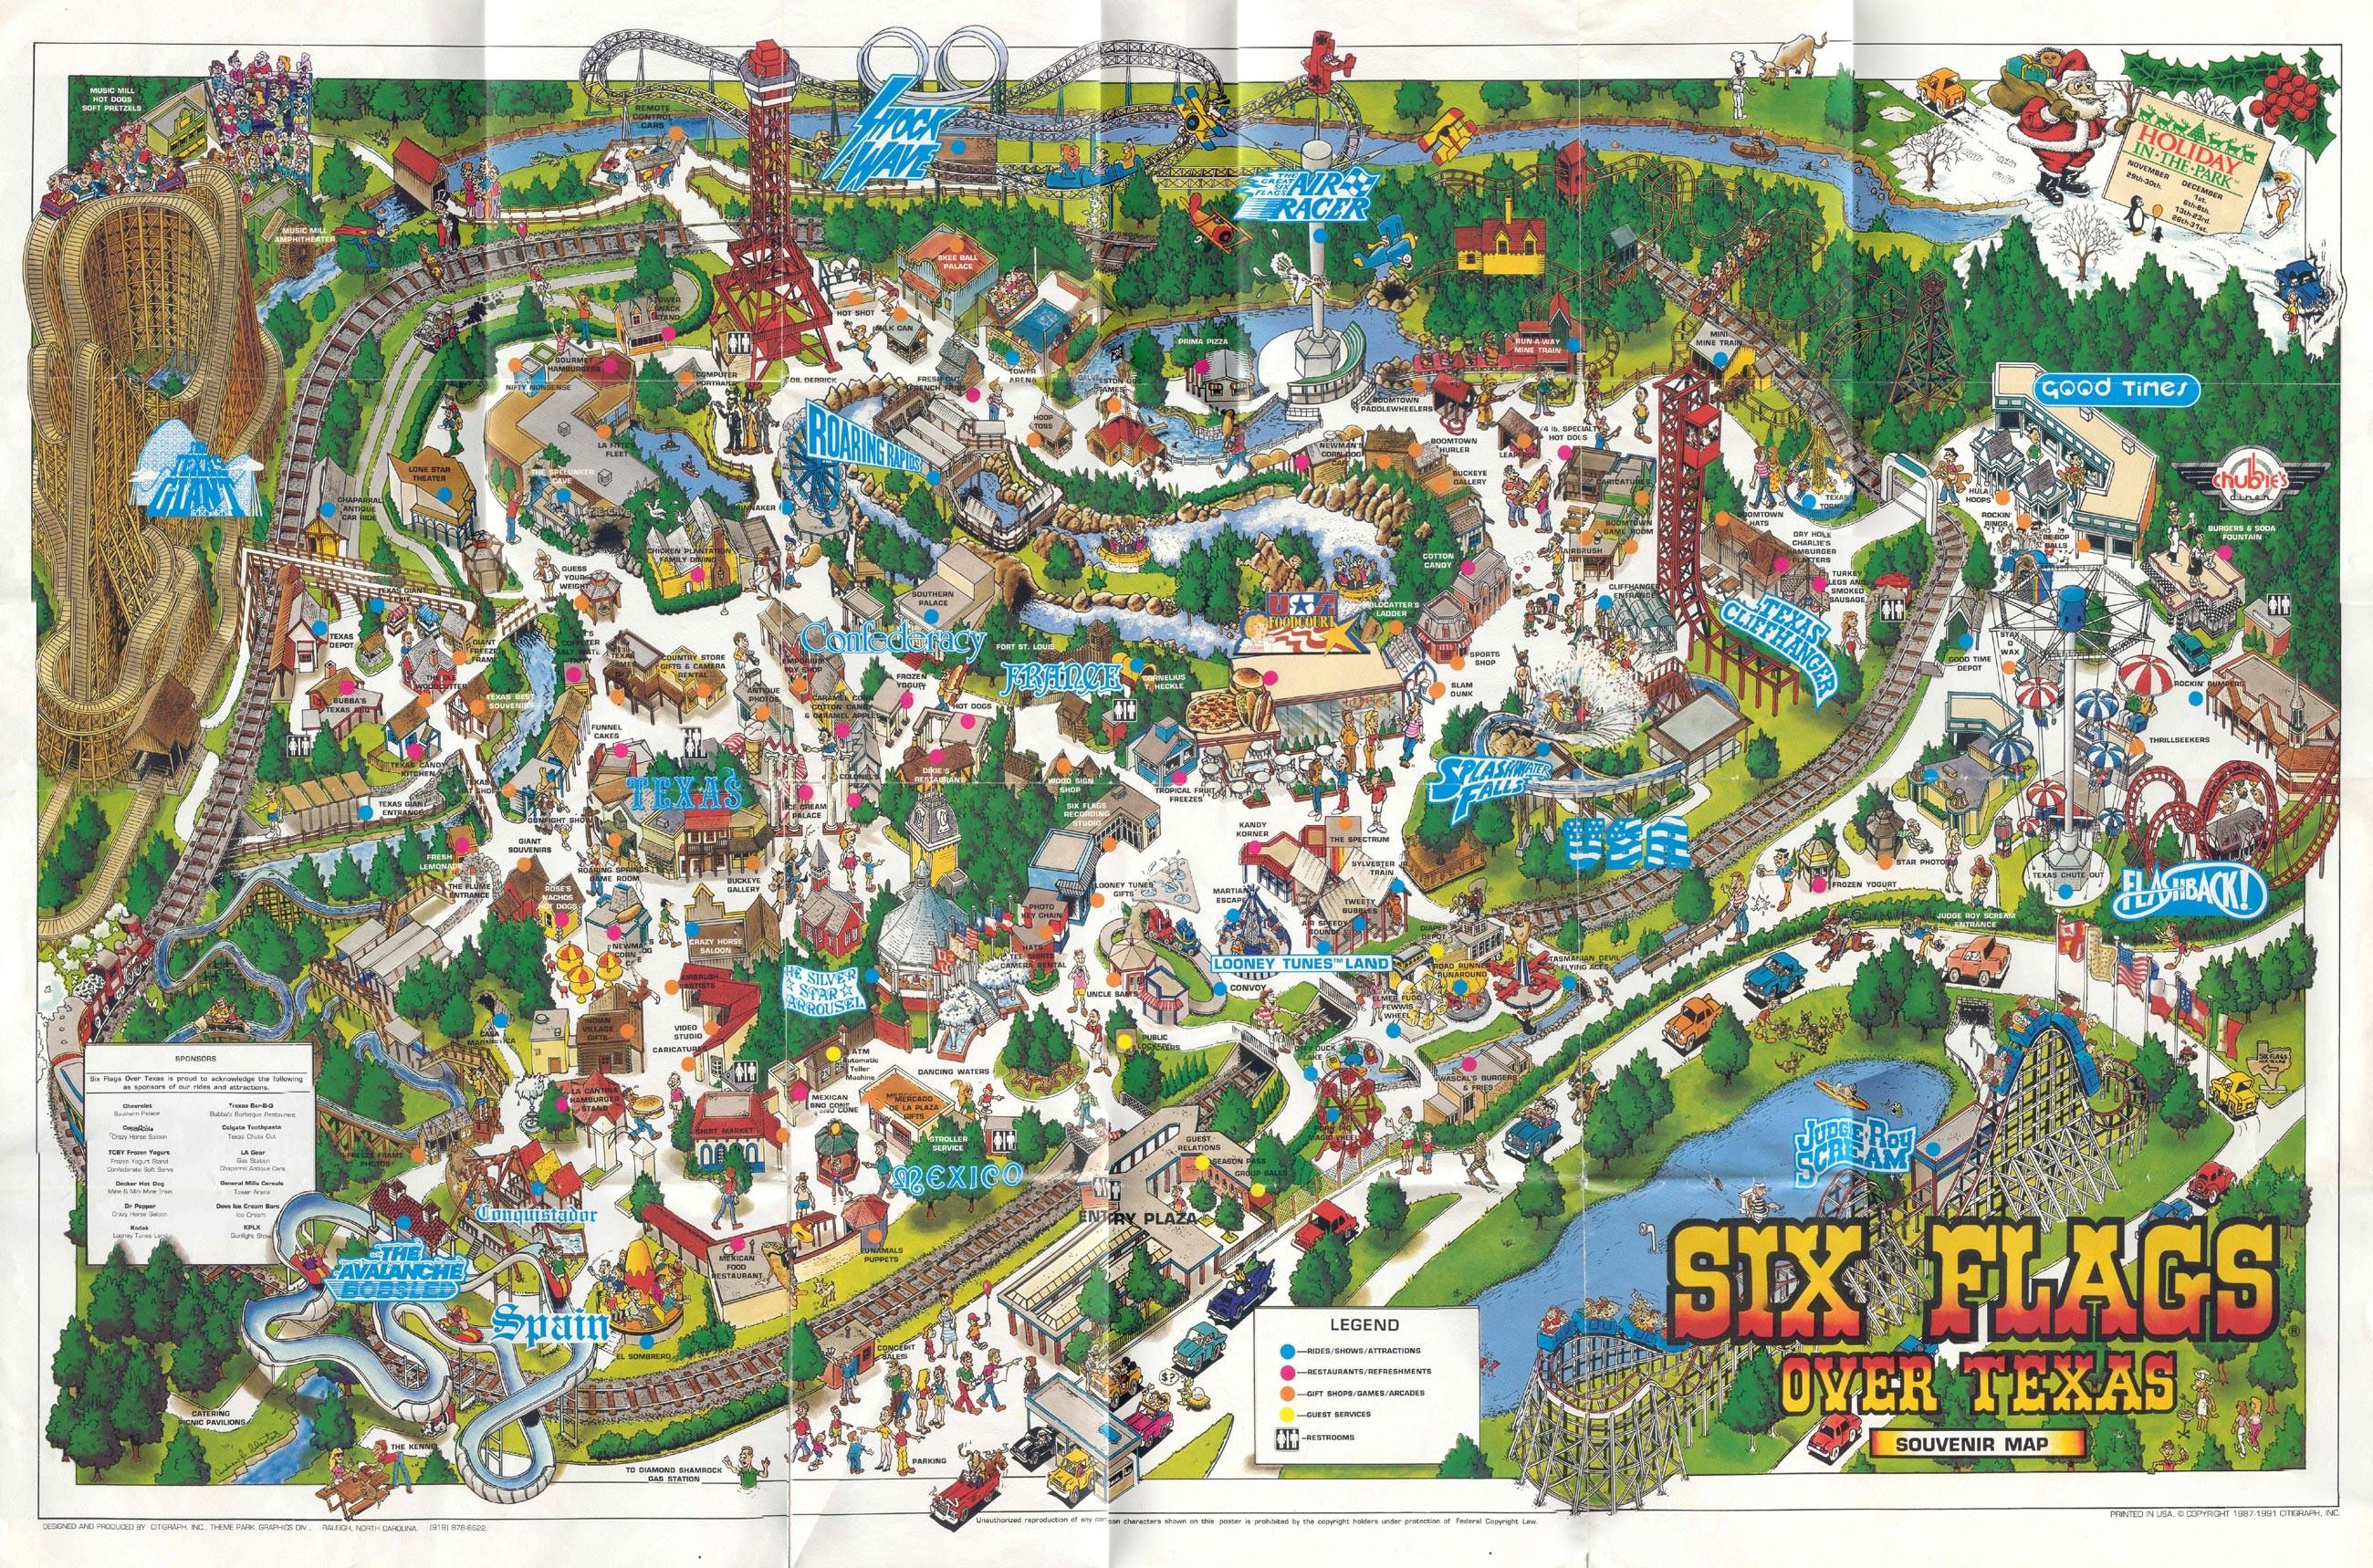 Six Flags Over Texas Map 1991 18 Six Flags Over Texas Map - Six Flags Over Texas Map App